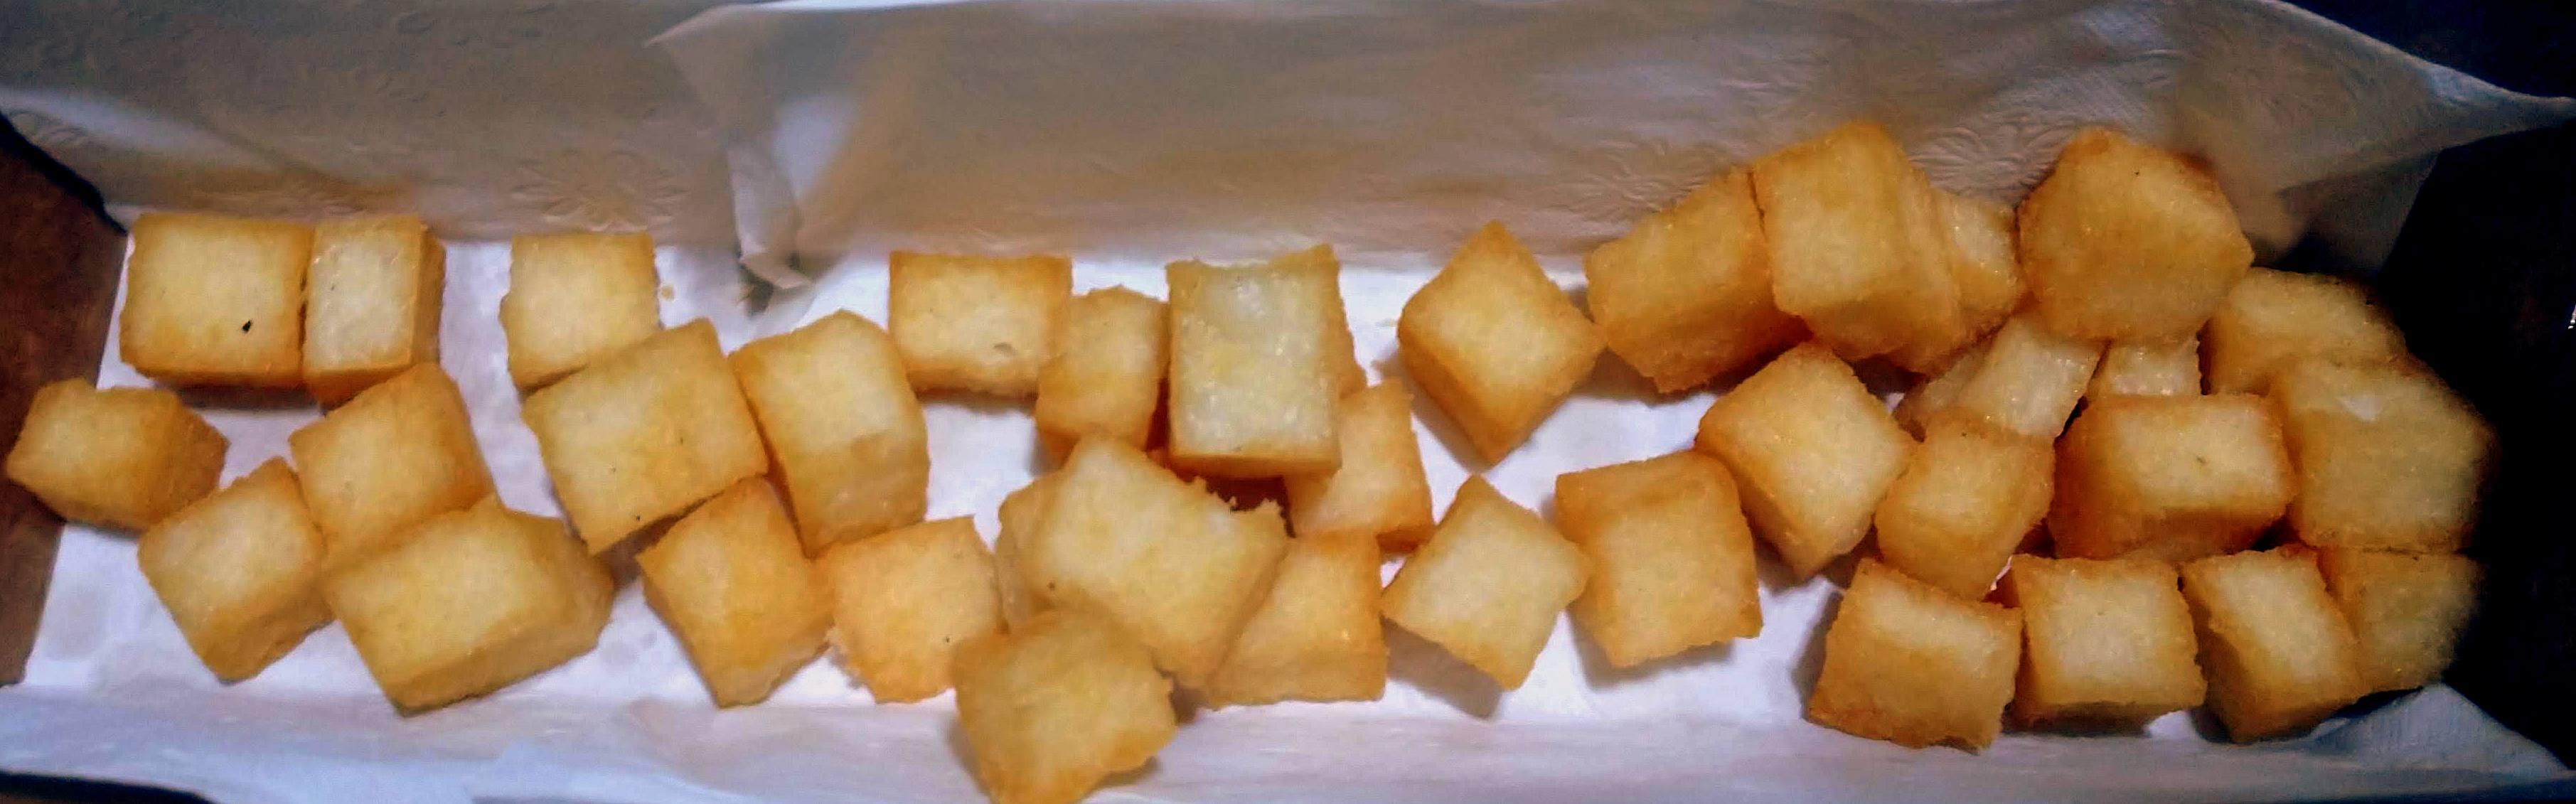 Polenta branca frita.